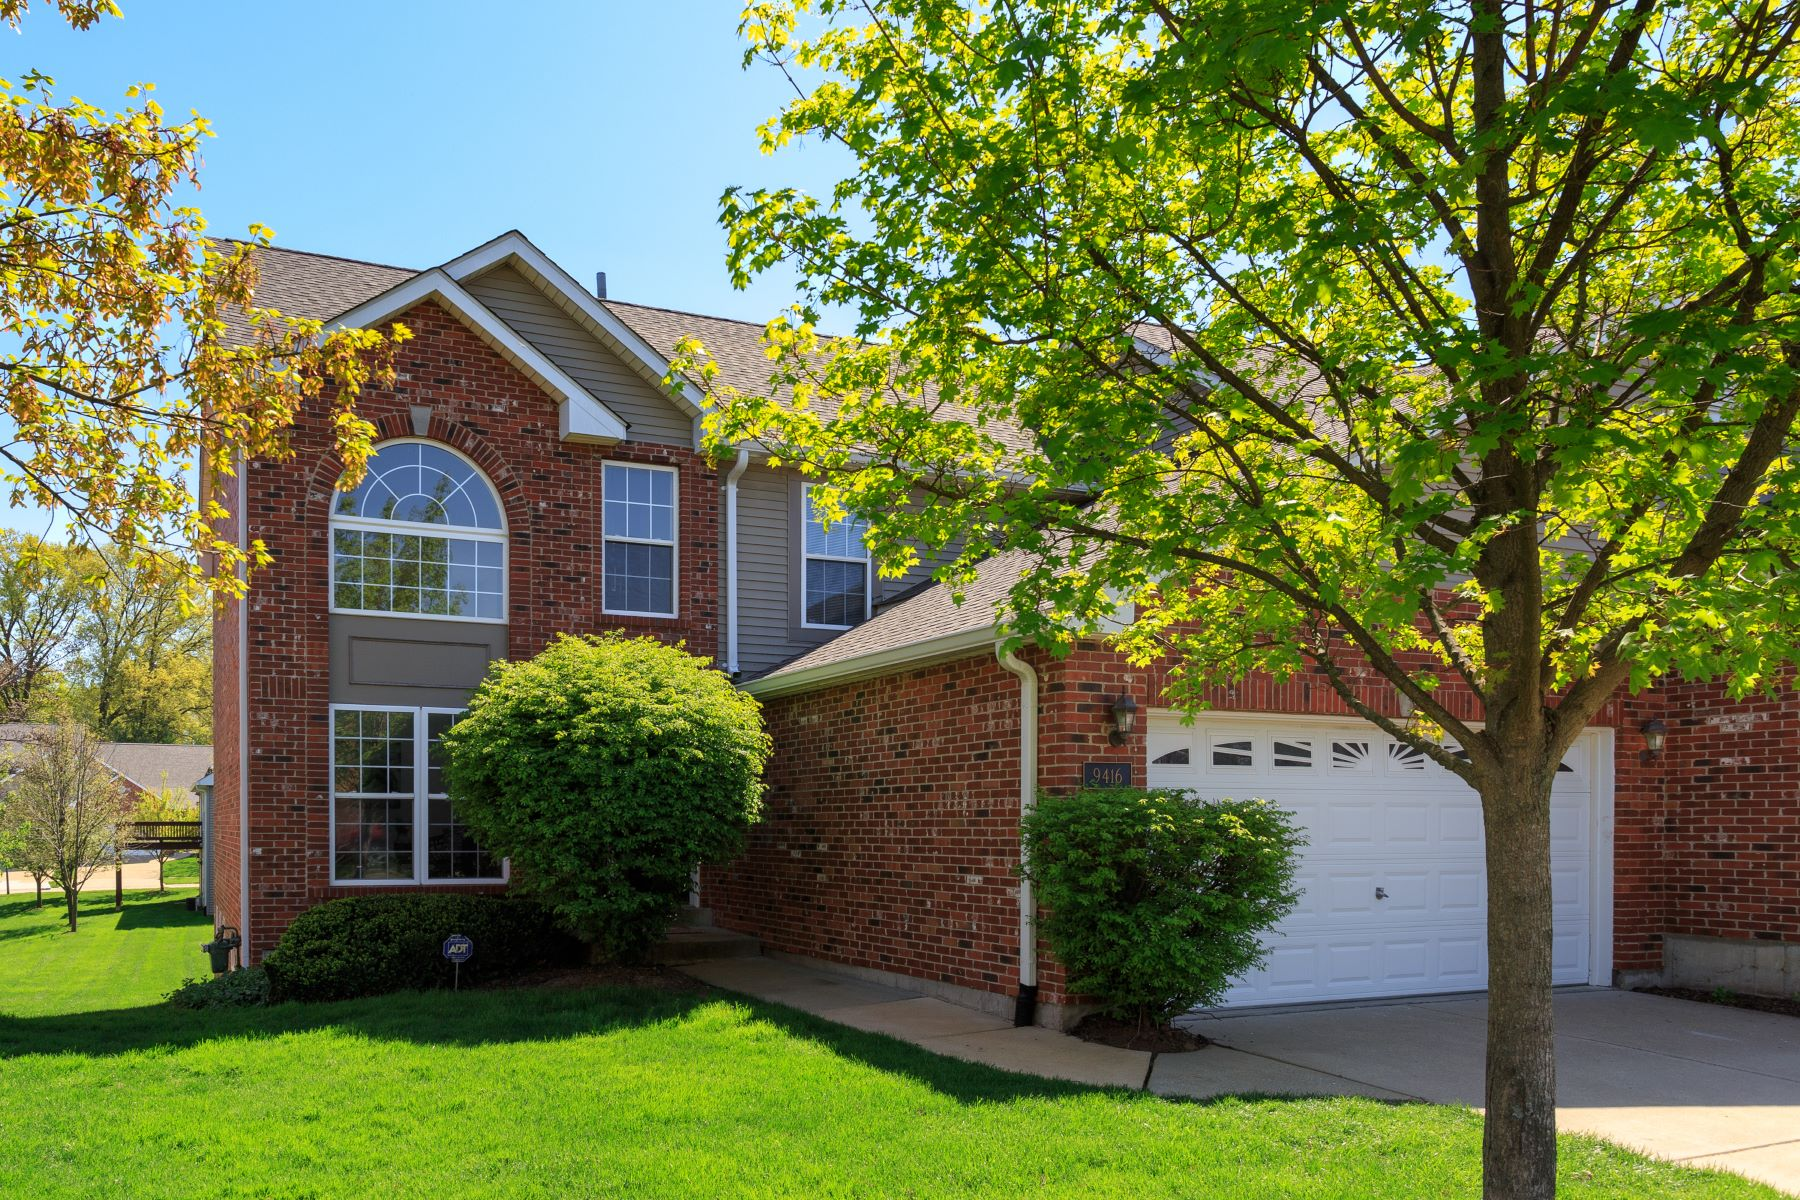 single family homes for Sale at Natalie Circle 9416 Natalie Circle Olivette, Missouri 63132 United States